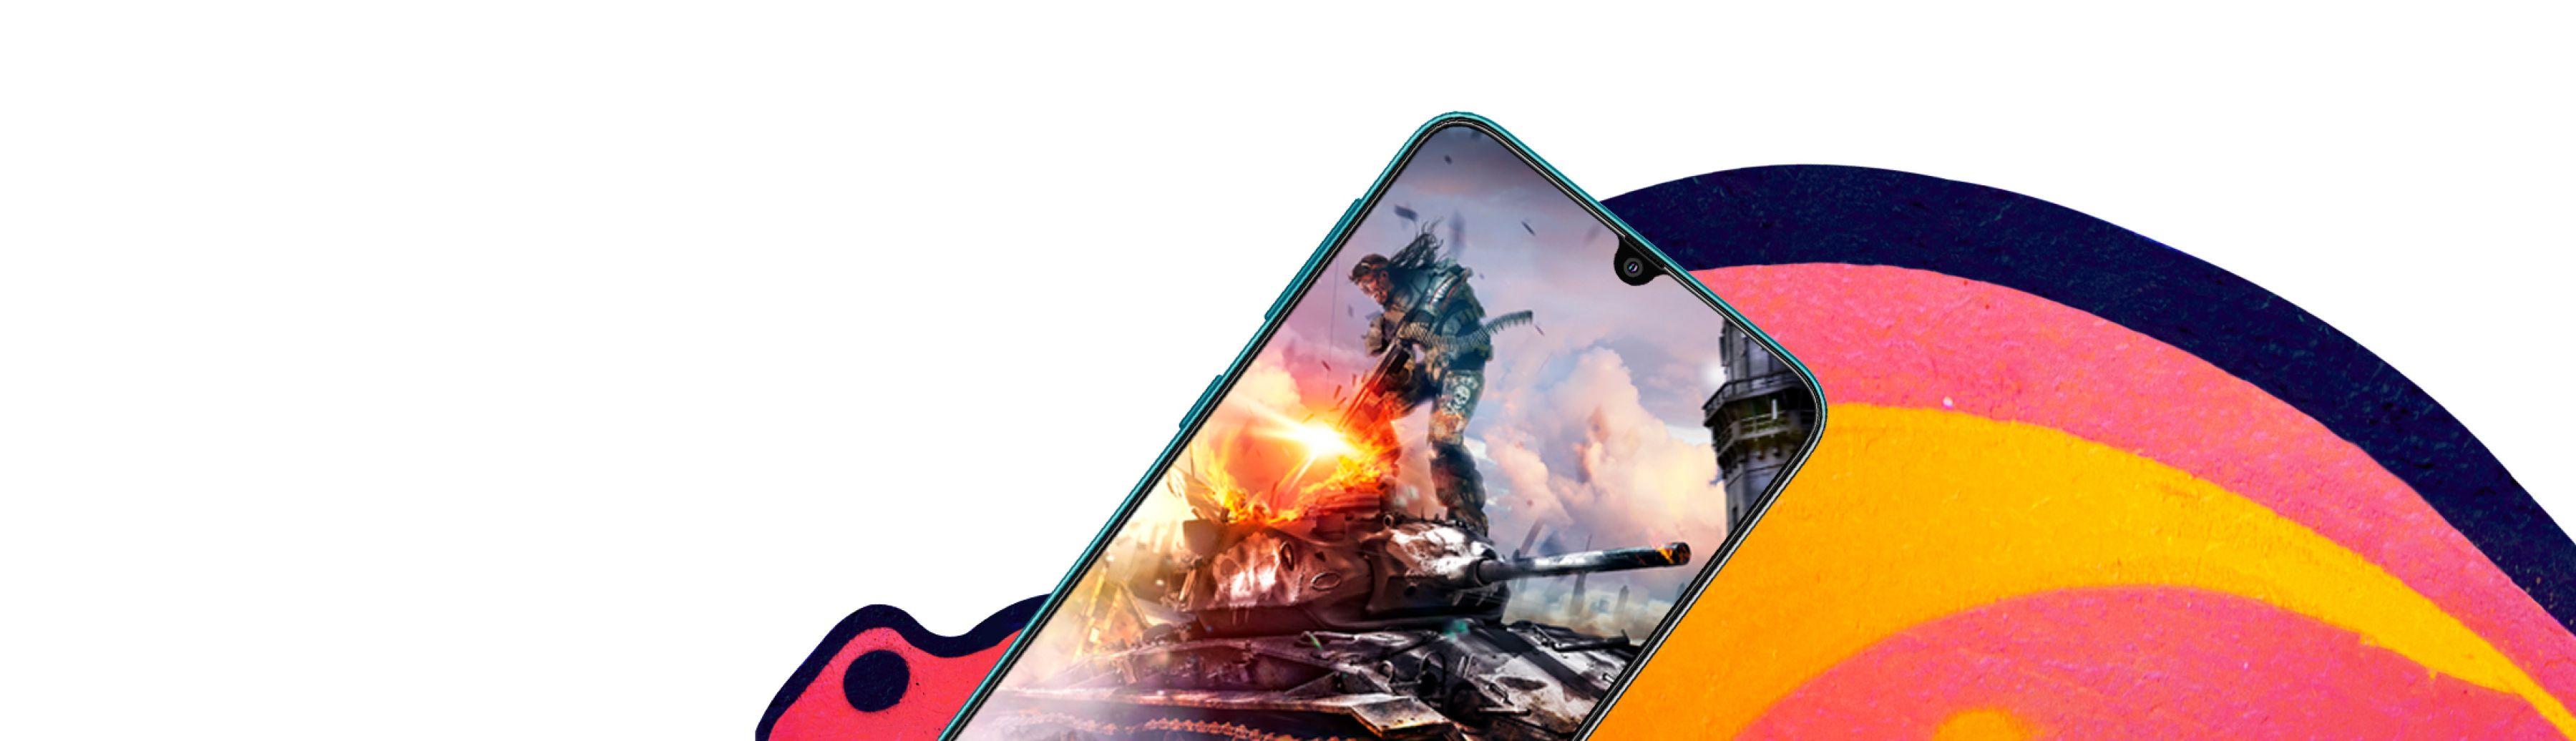 smartfon Samsung Galaxy F41 smartphone